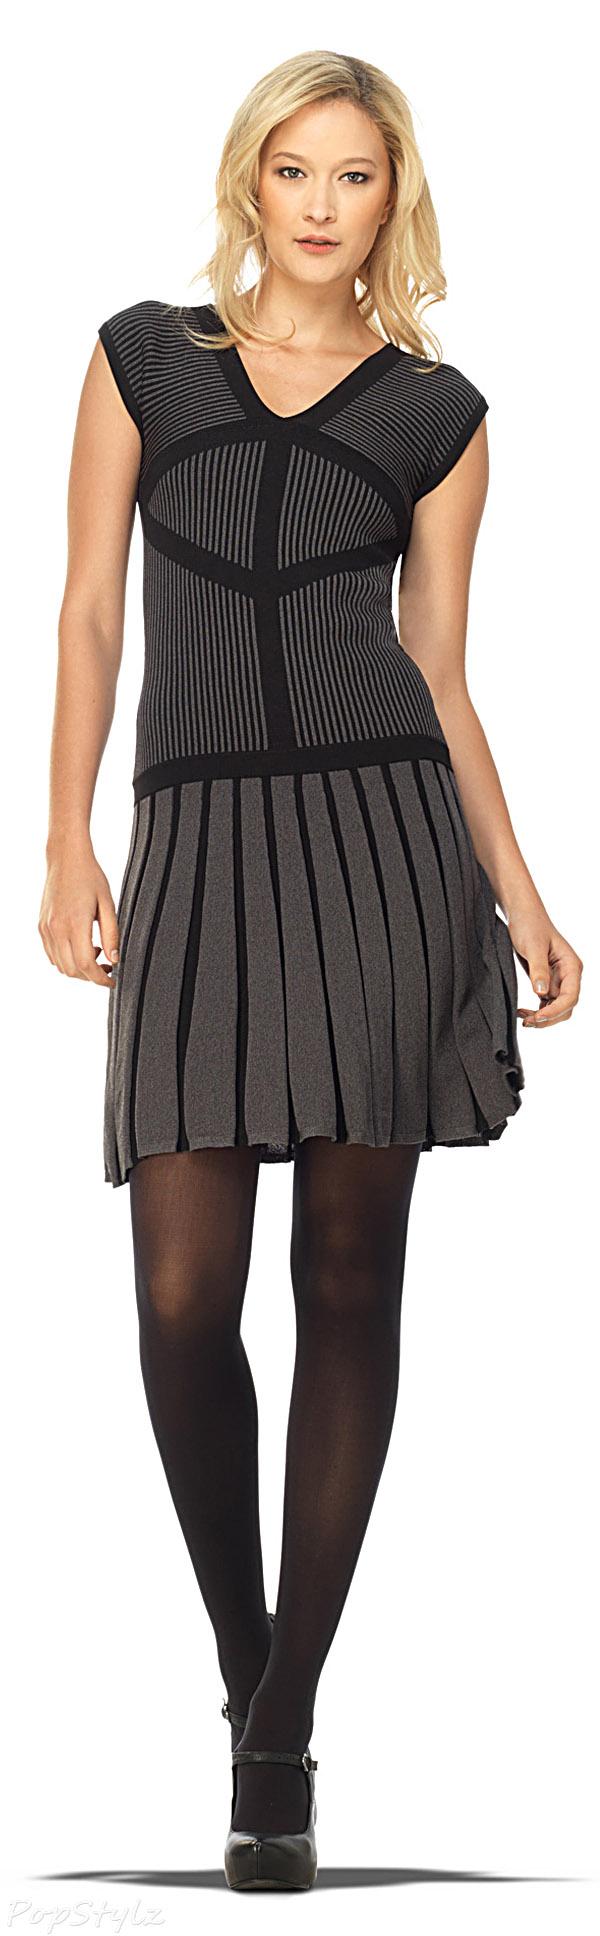 MAXSTUDIO Cap Sleeved Sweater Dress